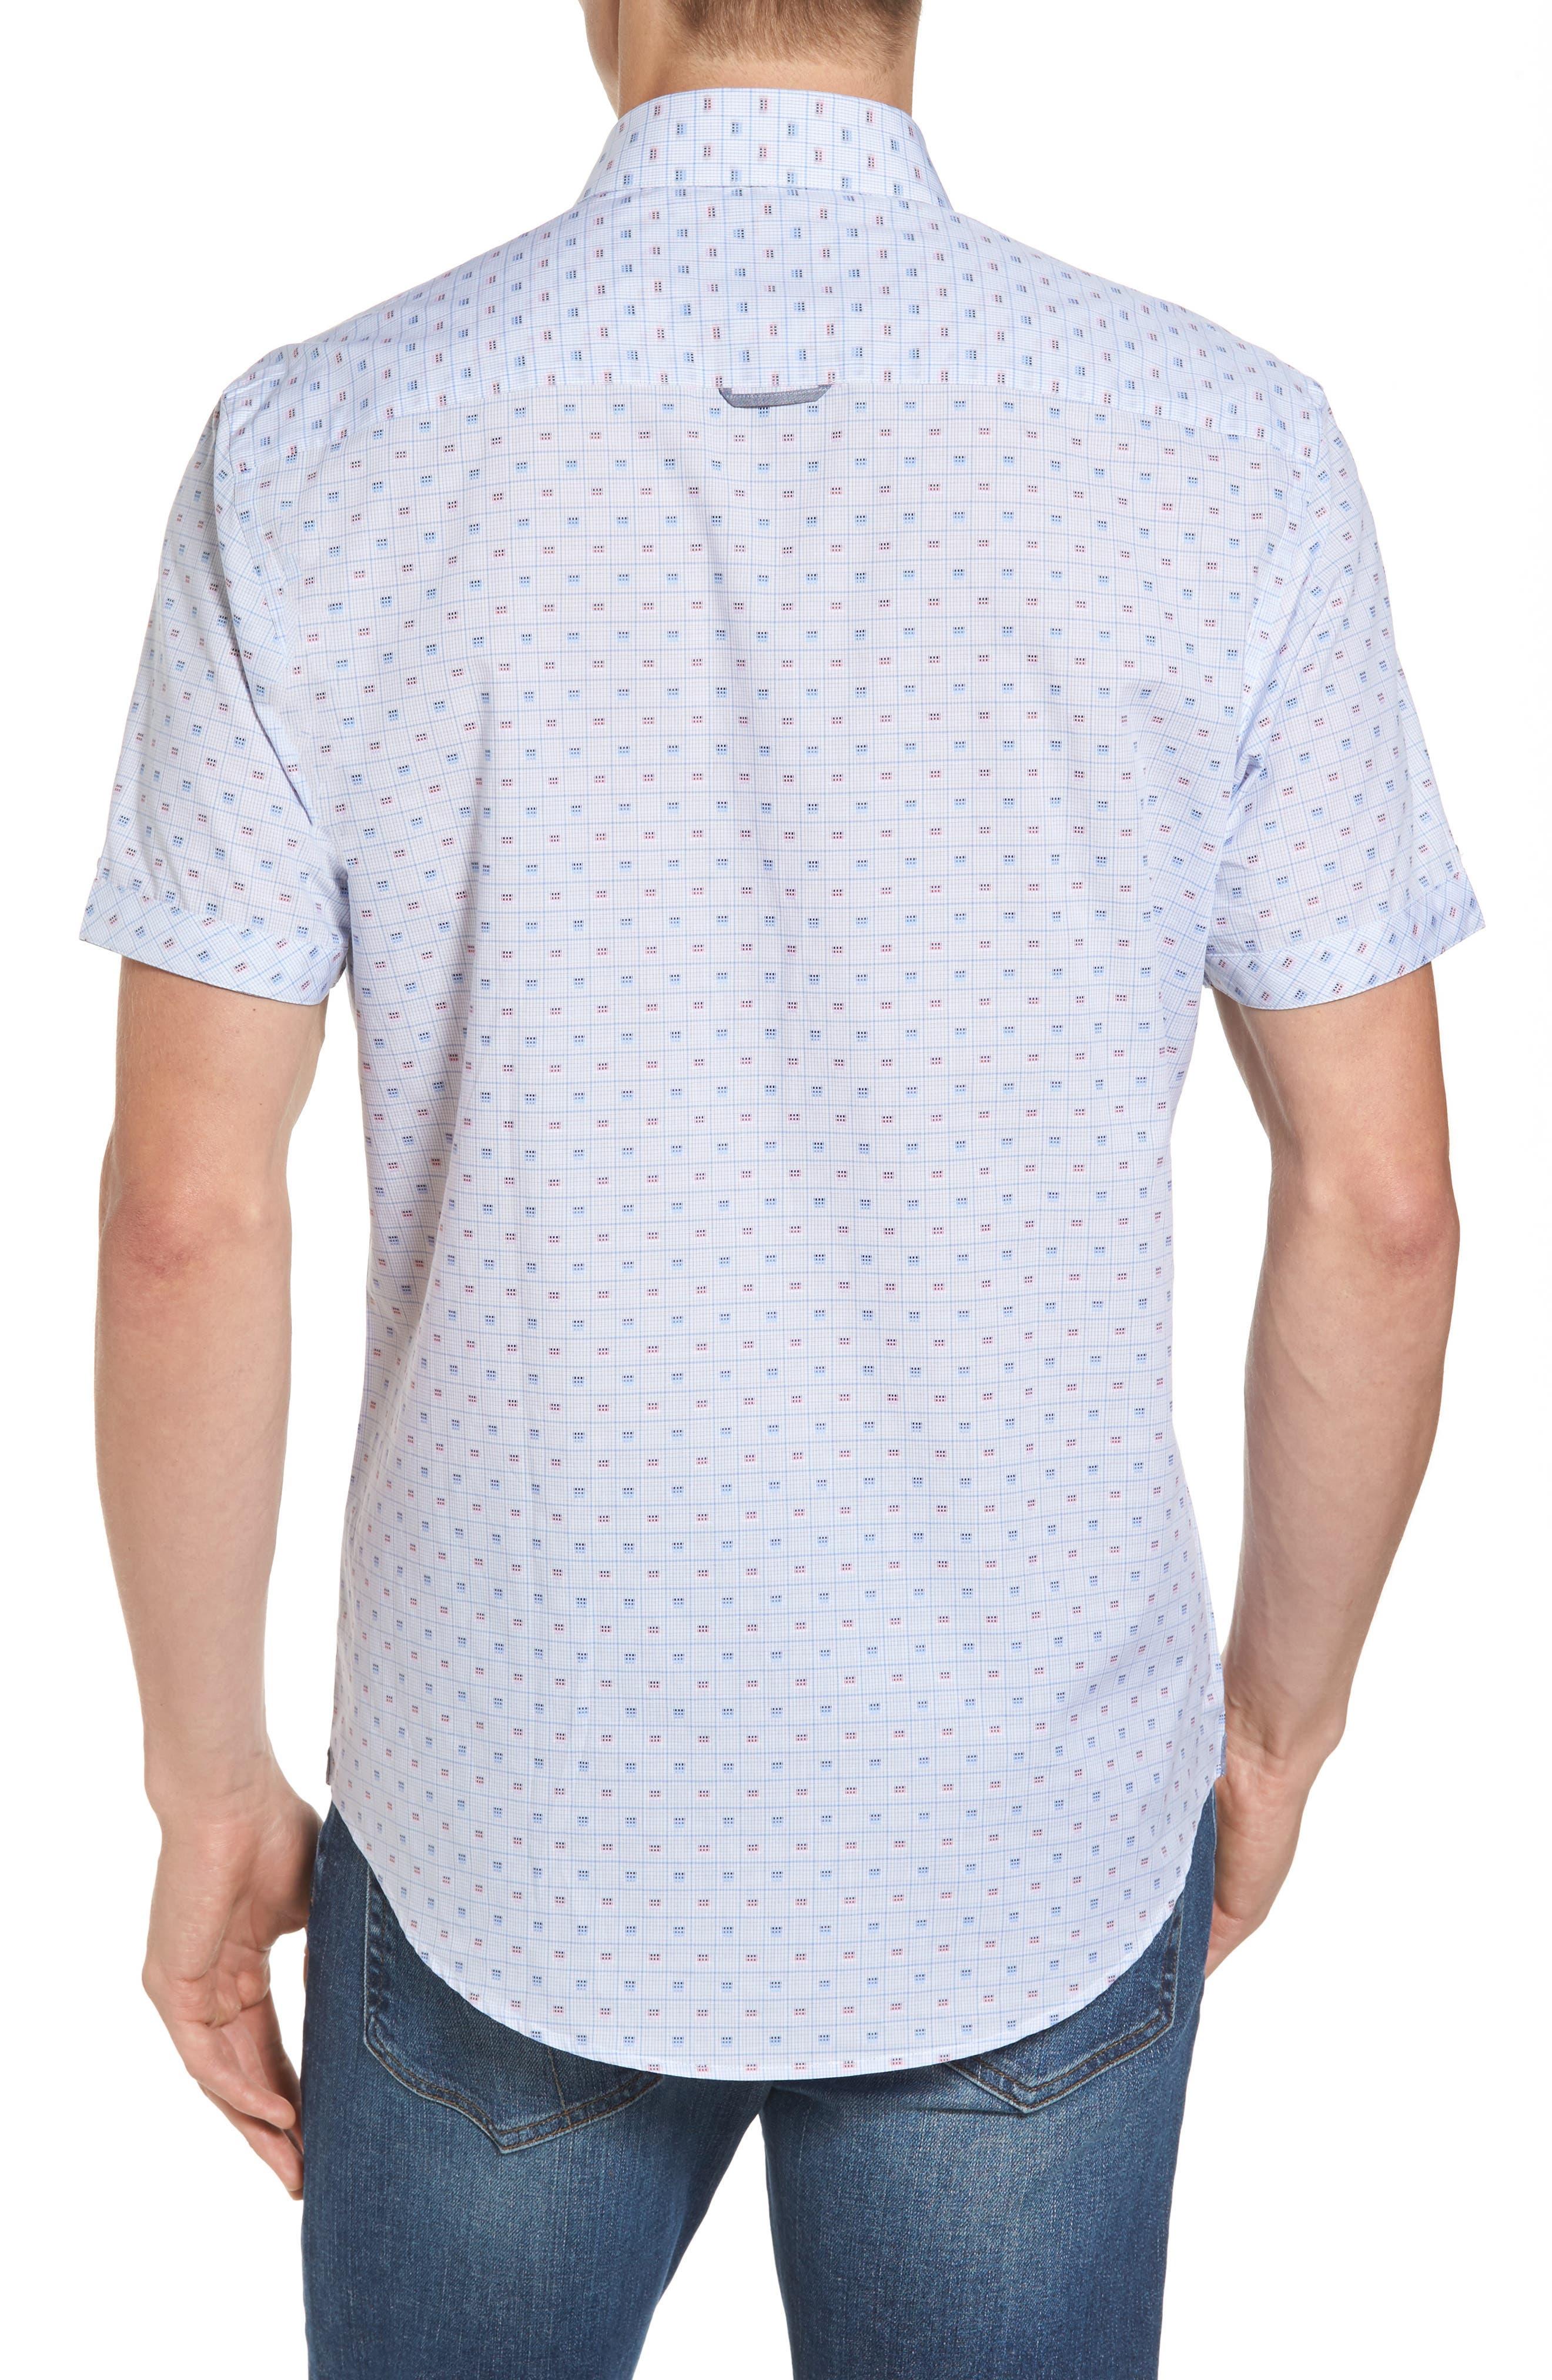 Atmosphere Woven Shirt,                             Alternate thumbnail 2, color,